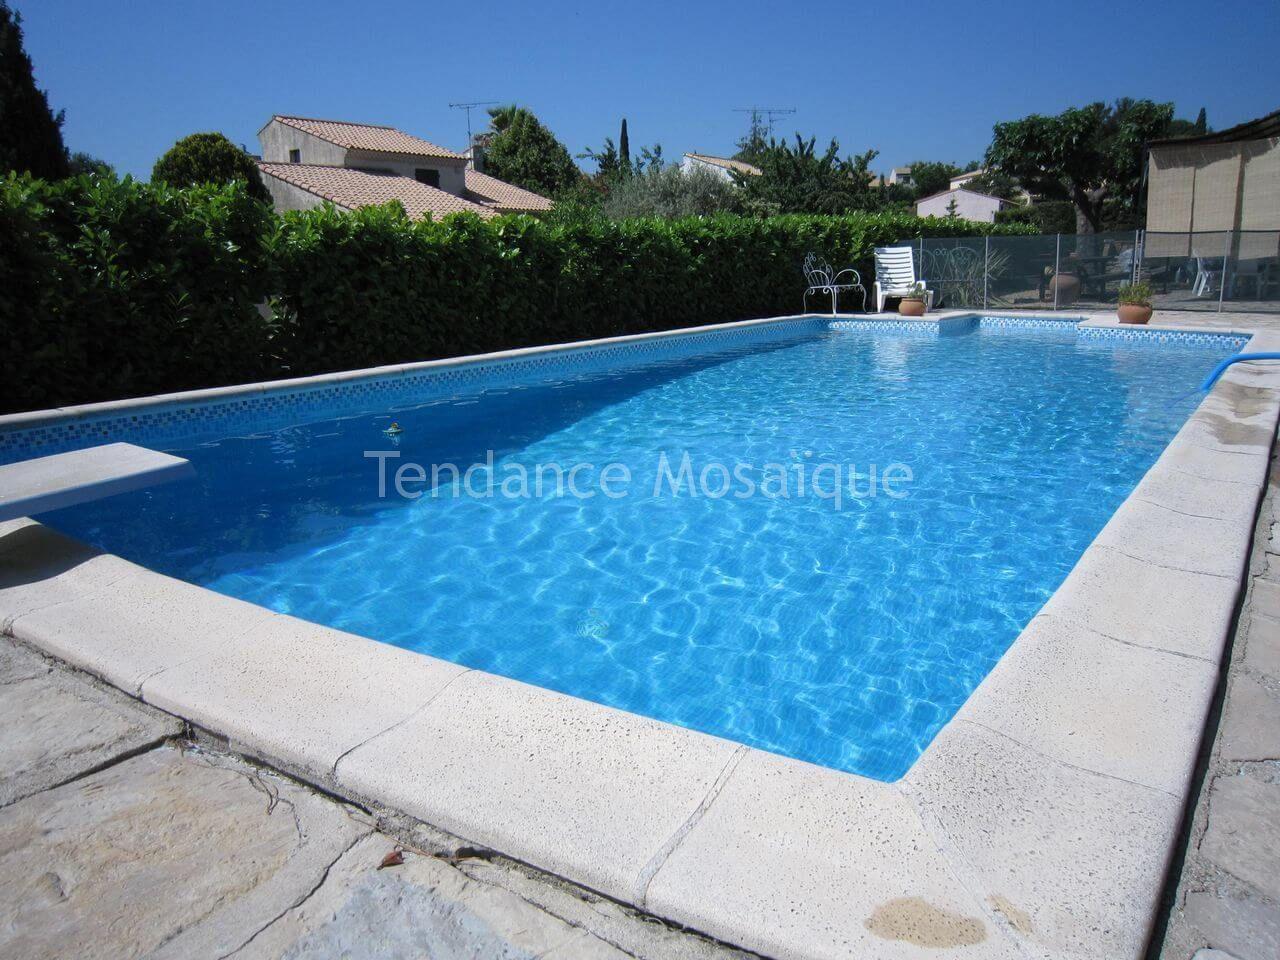 Carrelage piscine r alis avec maux de verre ezarri 2508a for Joint carrelage piscine